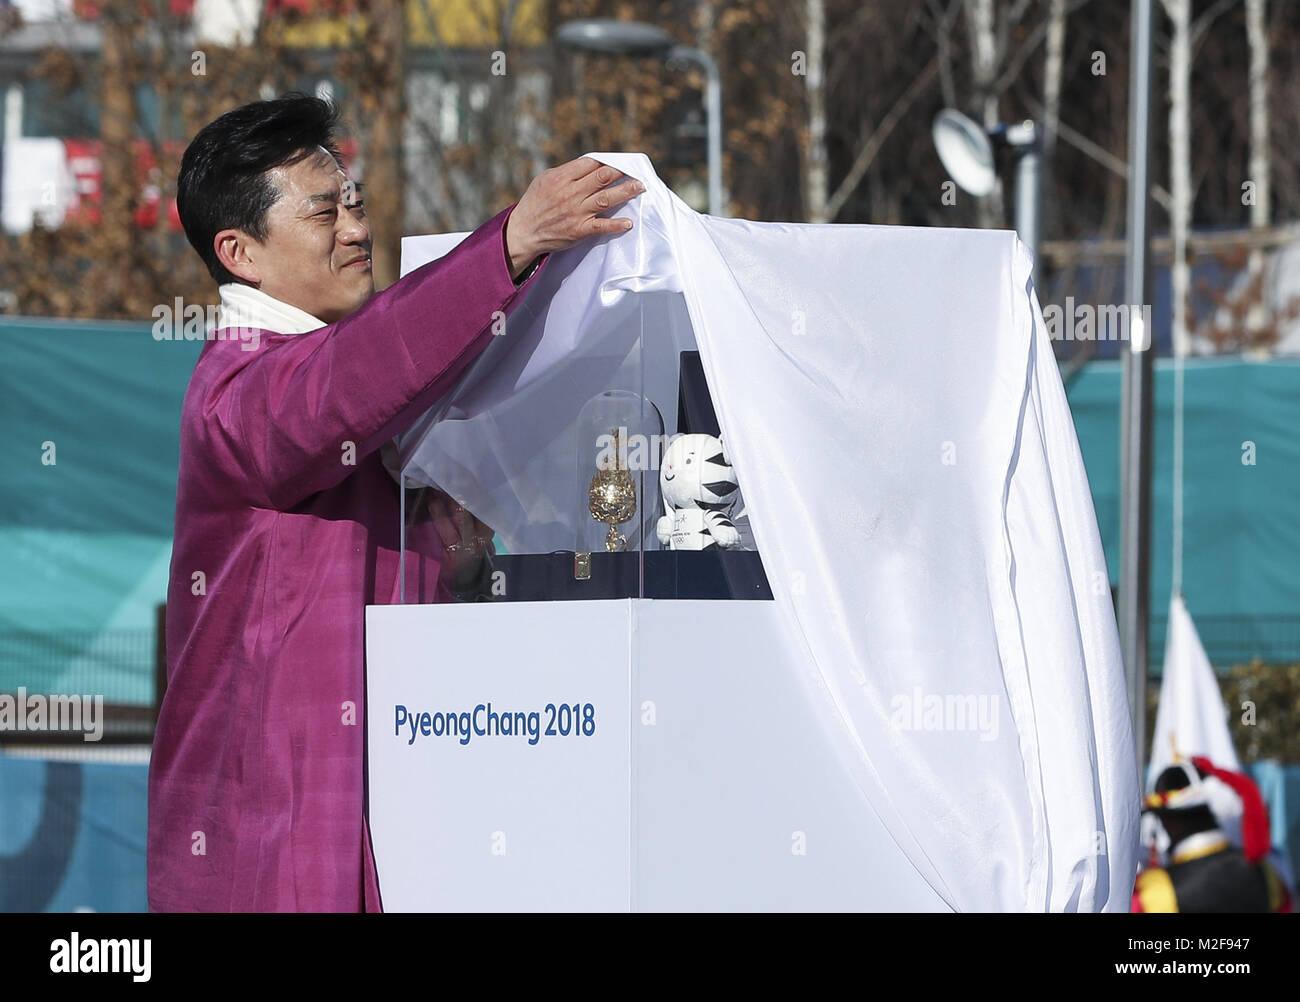 Pyeongchang, South Korea. 7th Feb, 2018. Mayor of Gangneung Olympic Village Kim Ki-hoon unveils the gifts for Chinese Stock Photo